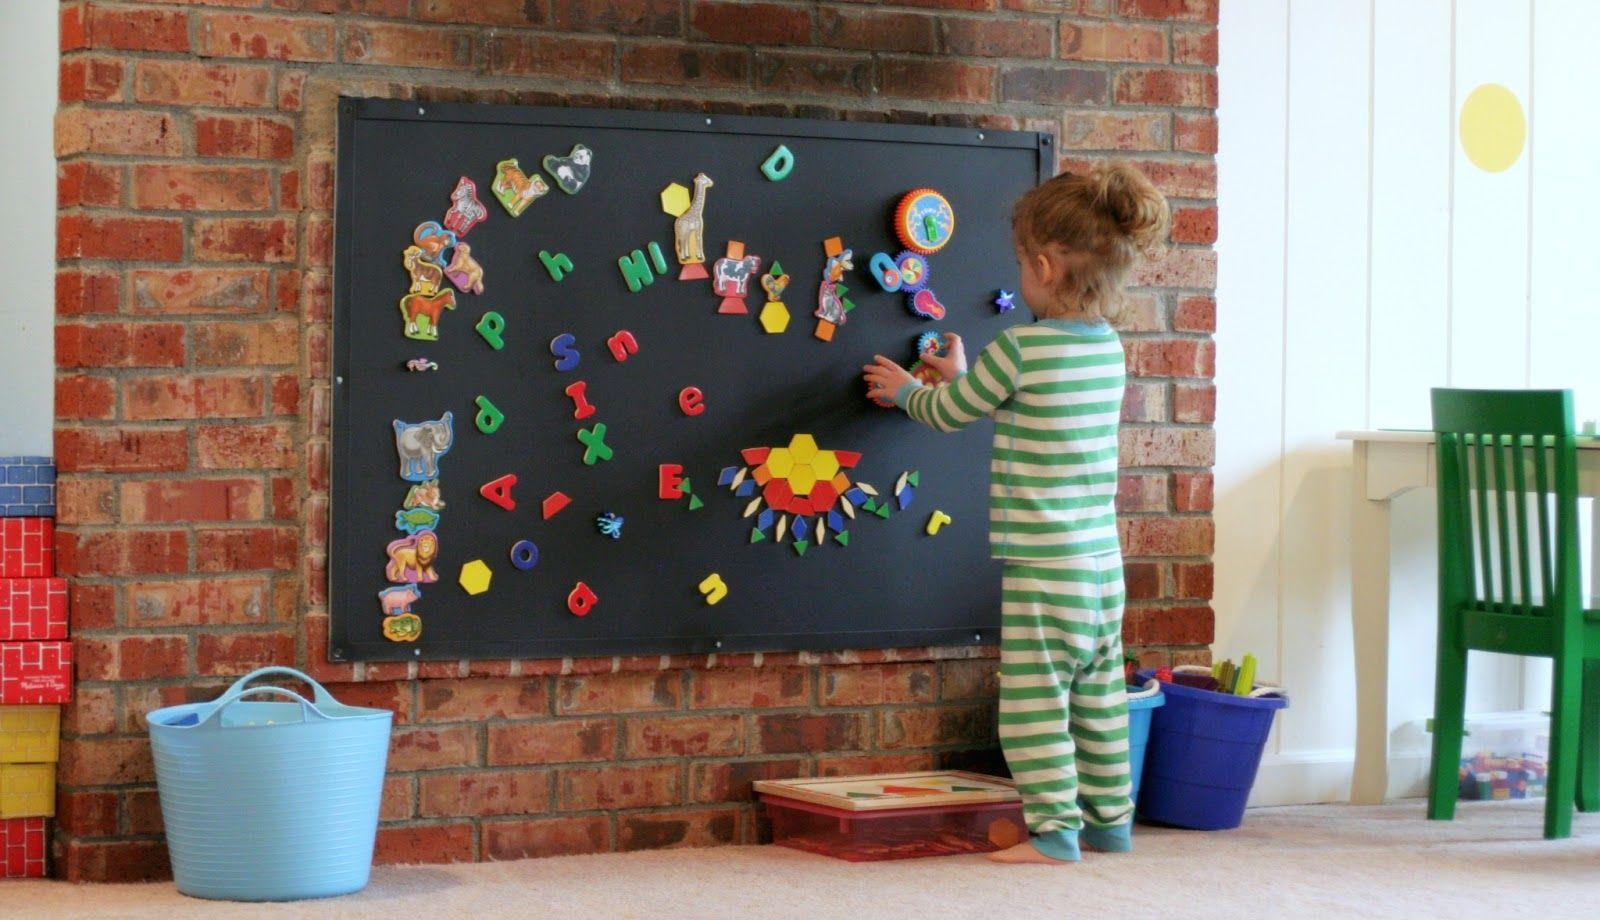 Playroom Design DIY Playroom with Rock Wall